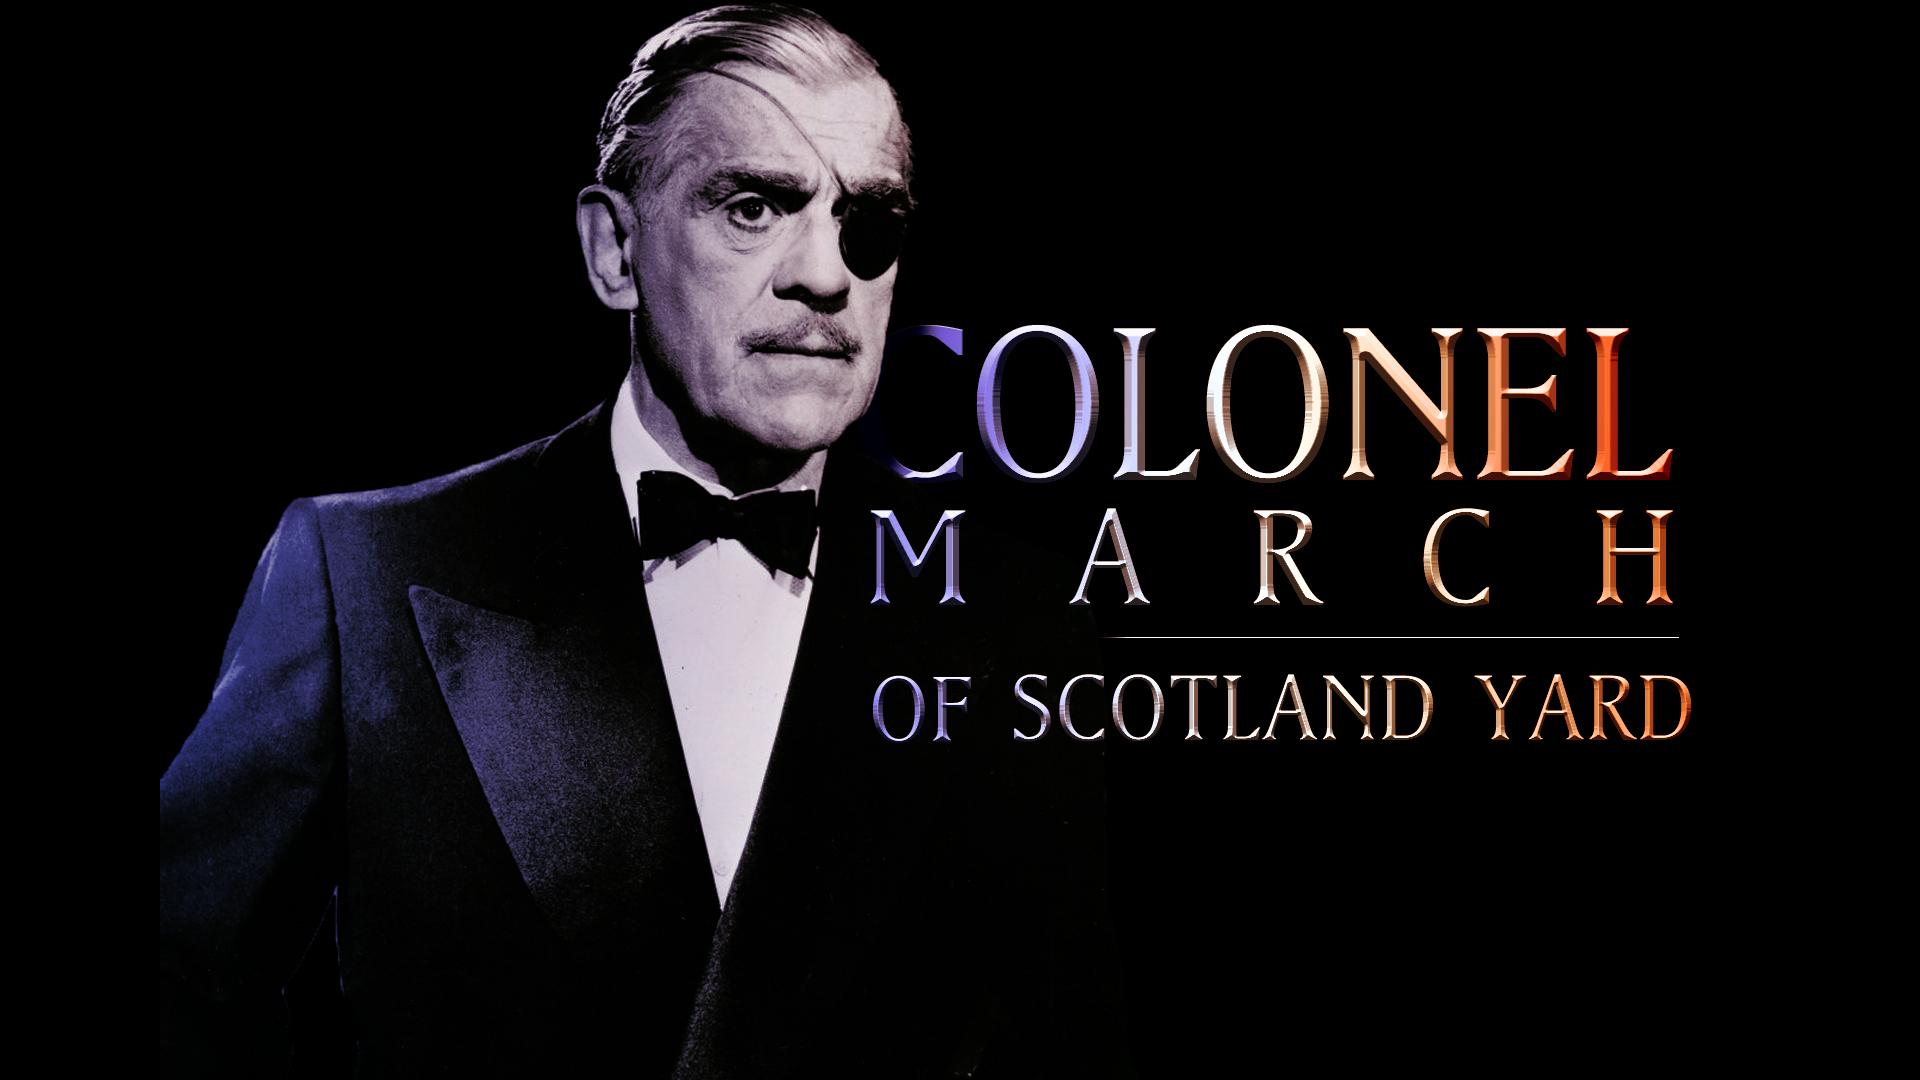 Colonel March of Scotland Yard